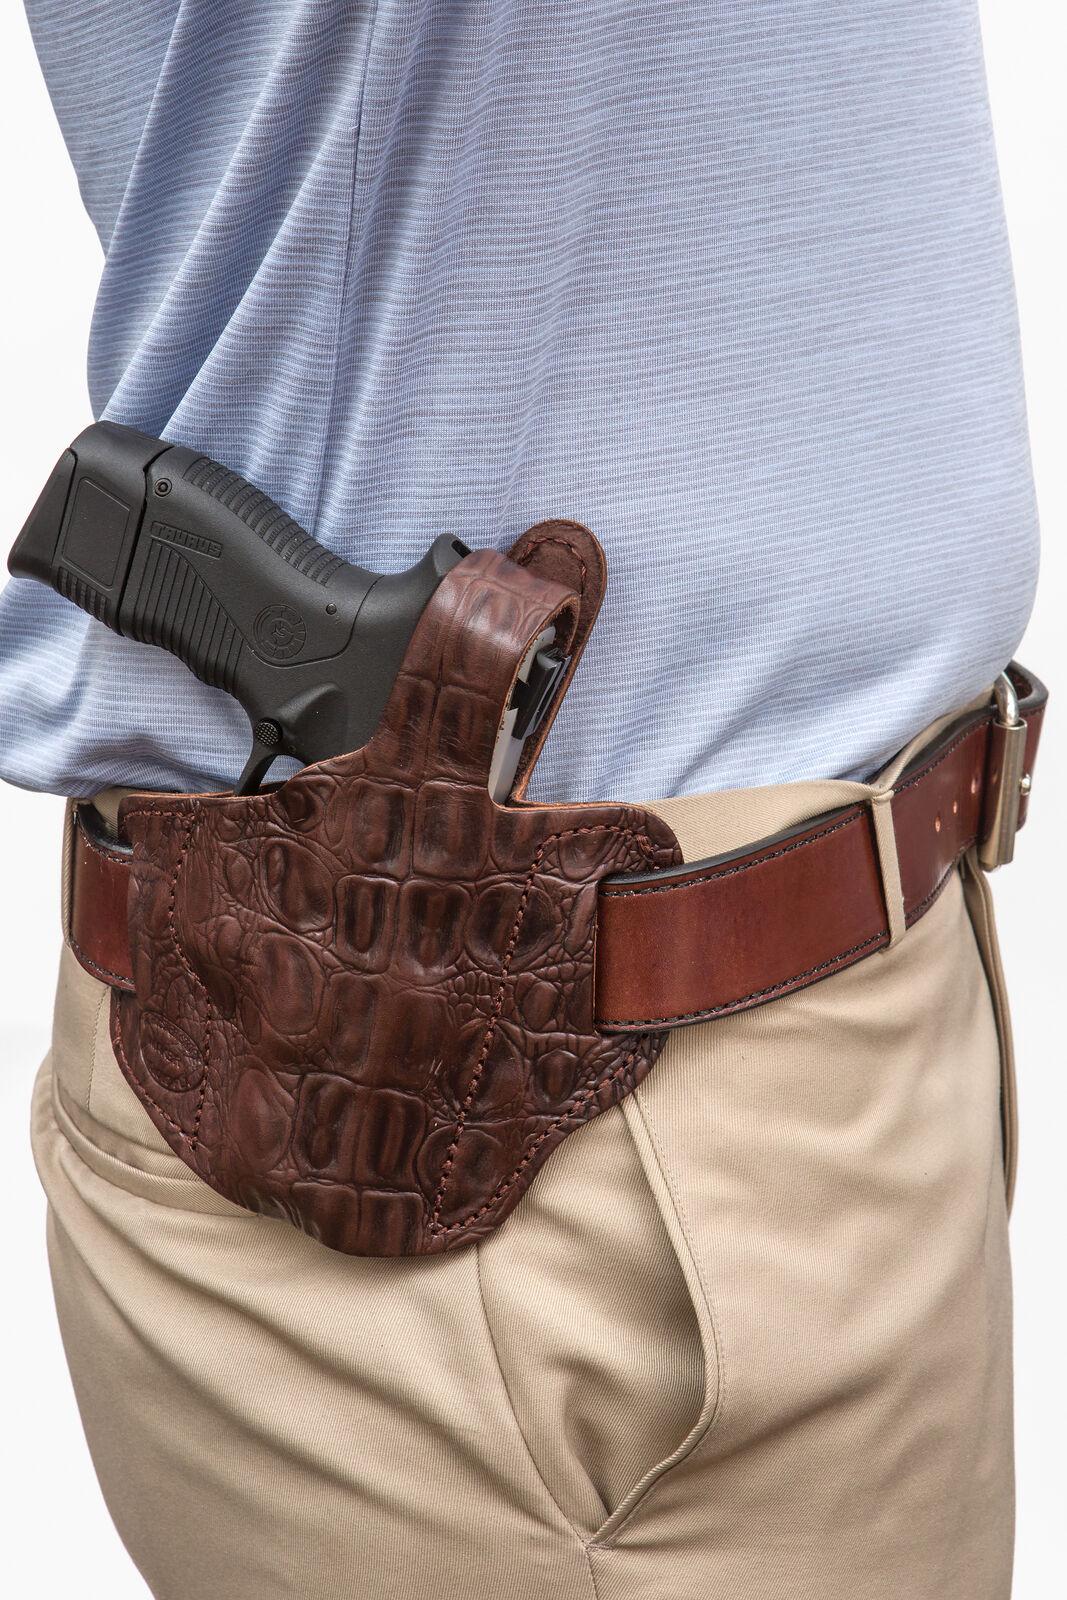 On Duty Conceal RH LH OWB OWB LH Leder Gun Holster For CHARLES DALY 1911 5